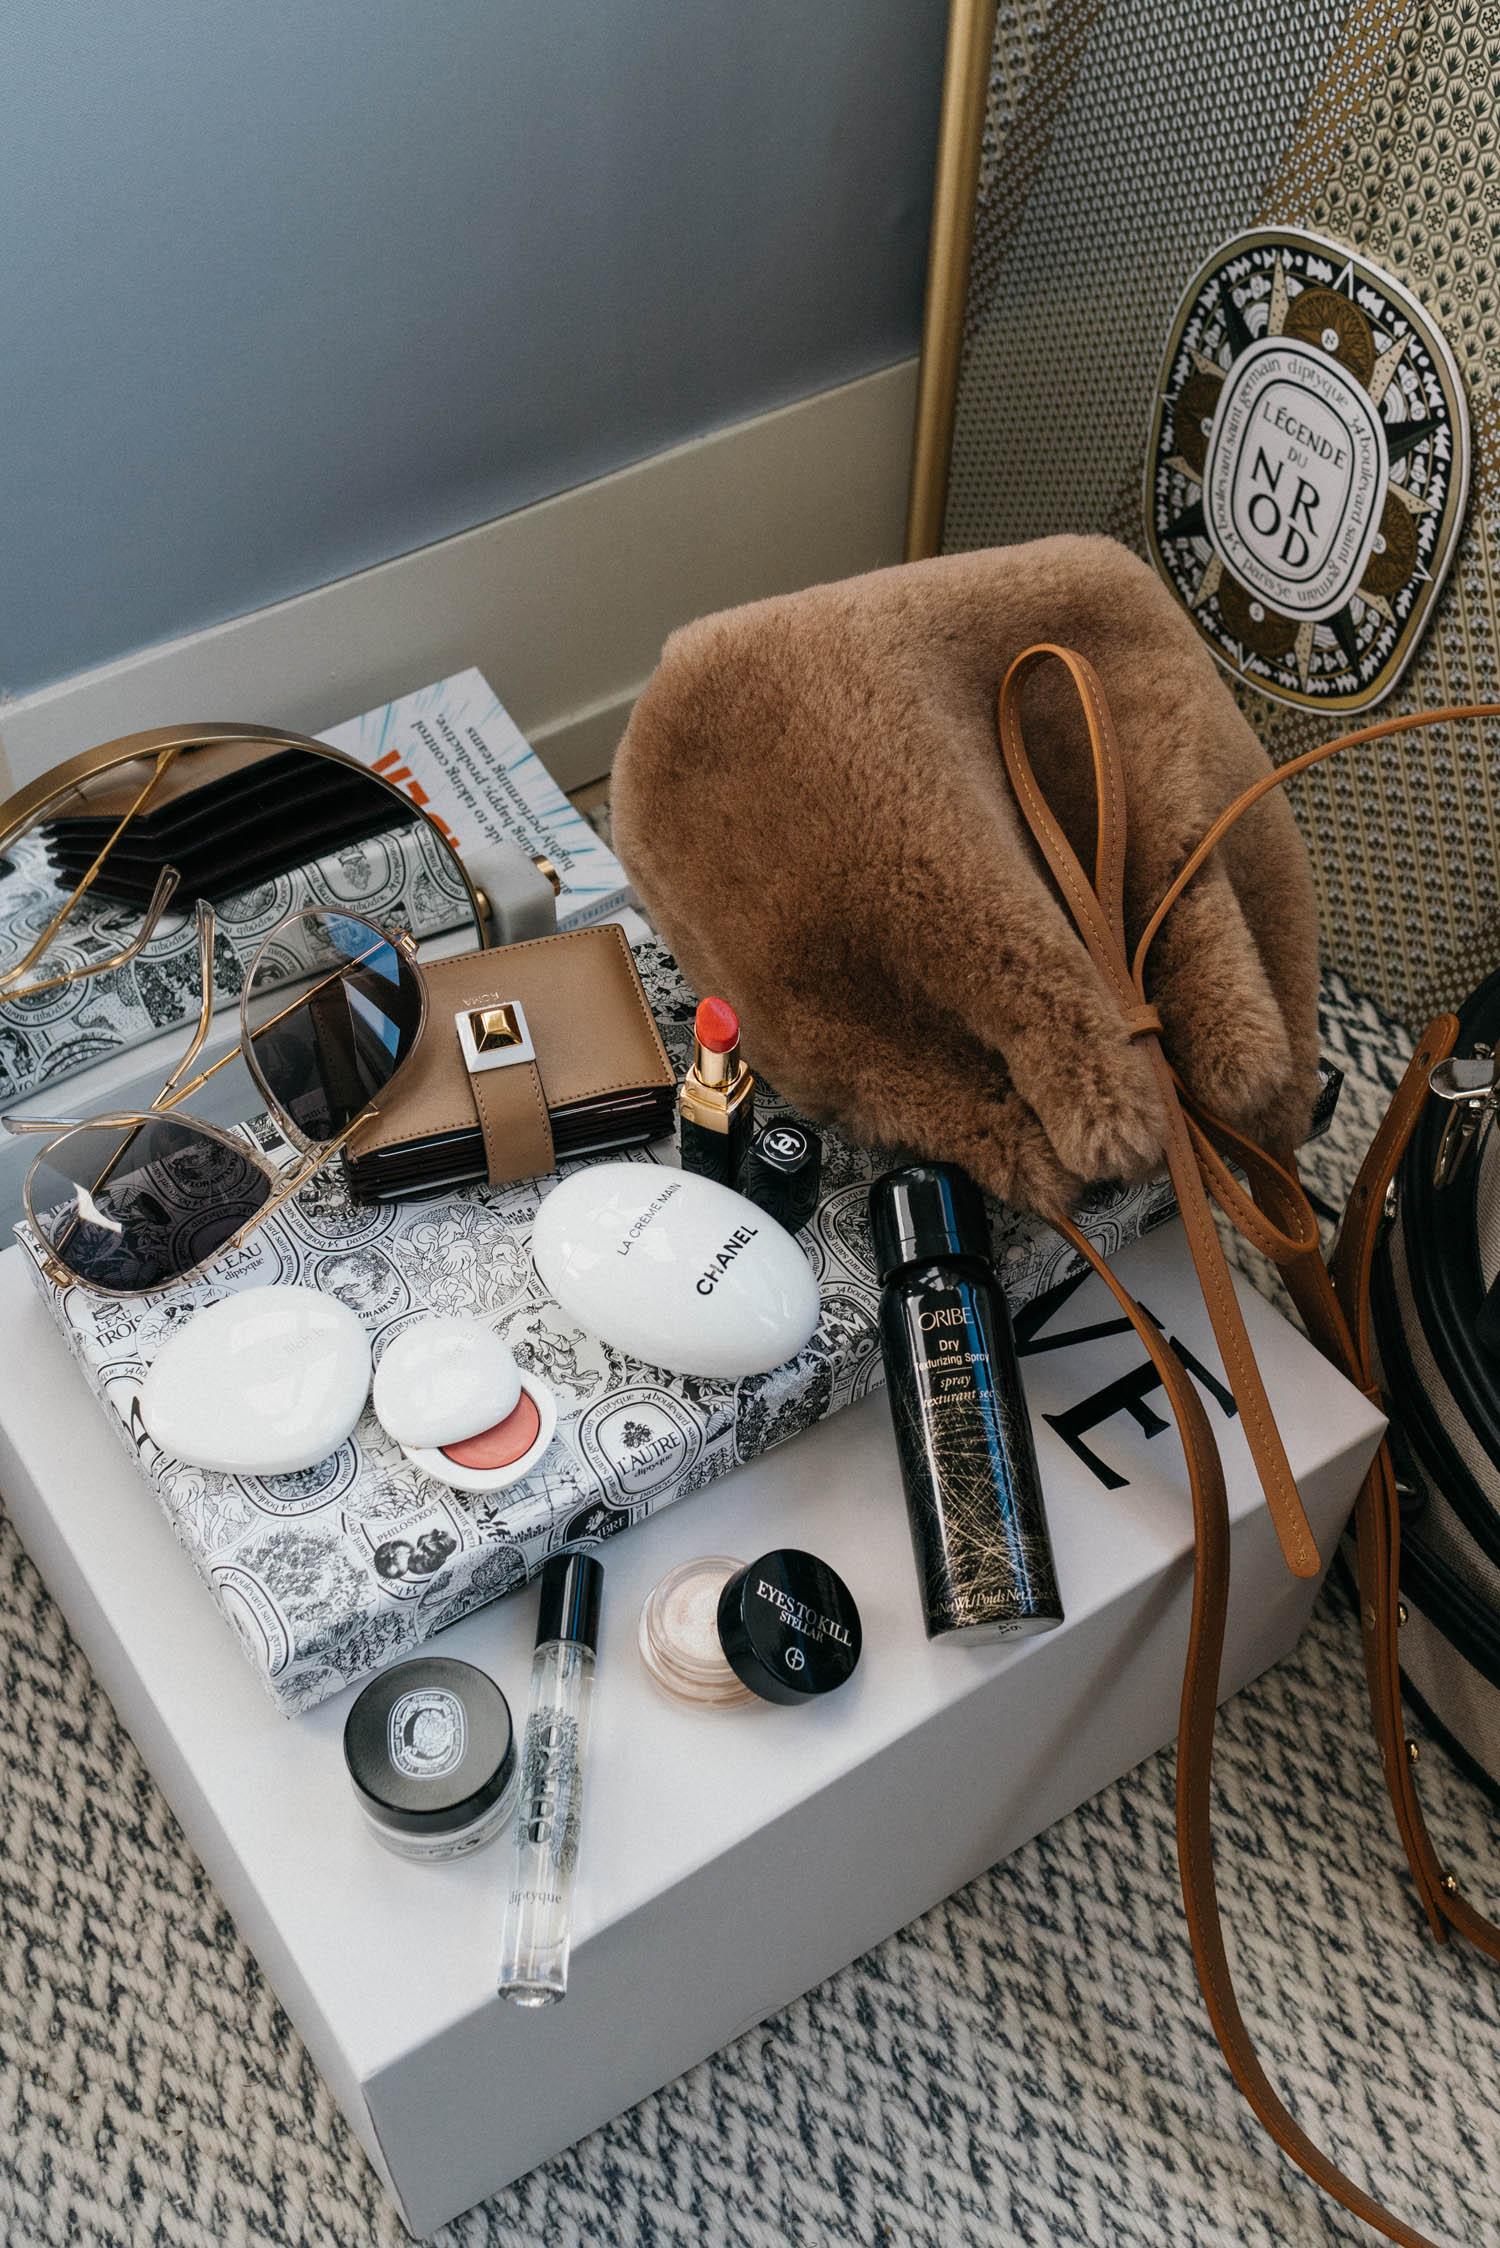 Céline Sunglasses ,  Lilah B Blush ,  CHANEL Hand Cream ,  CHANEL Lipstick , Fendi Wallet, Diptyque Fragrance, Diptyque Cream,  Oribe Spray ,  Mansur Gavriel Bag